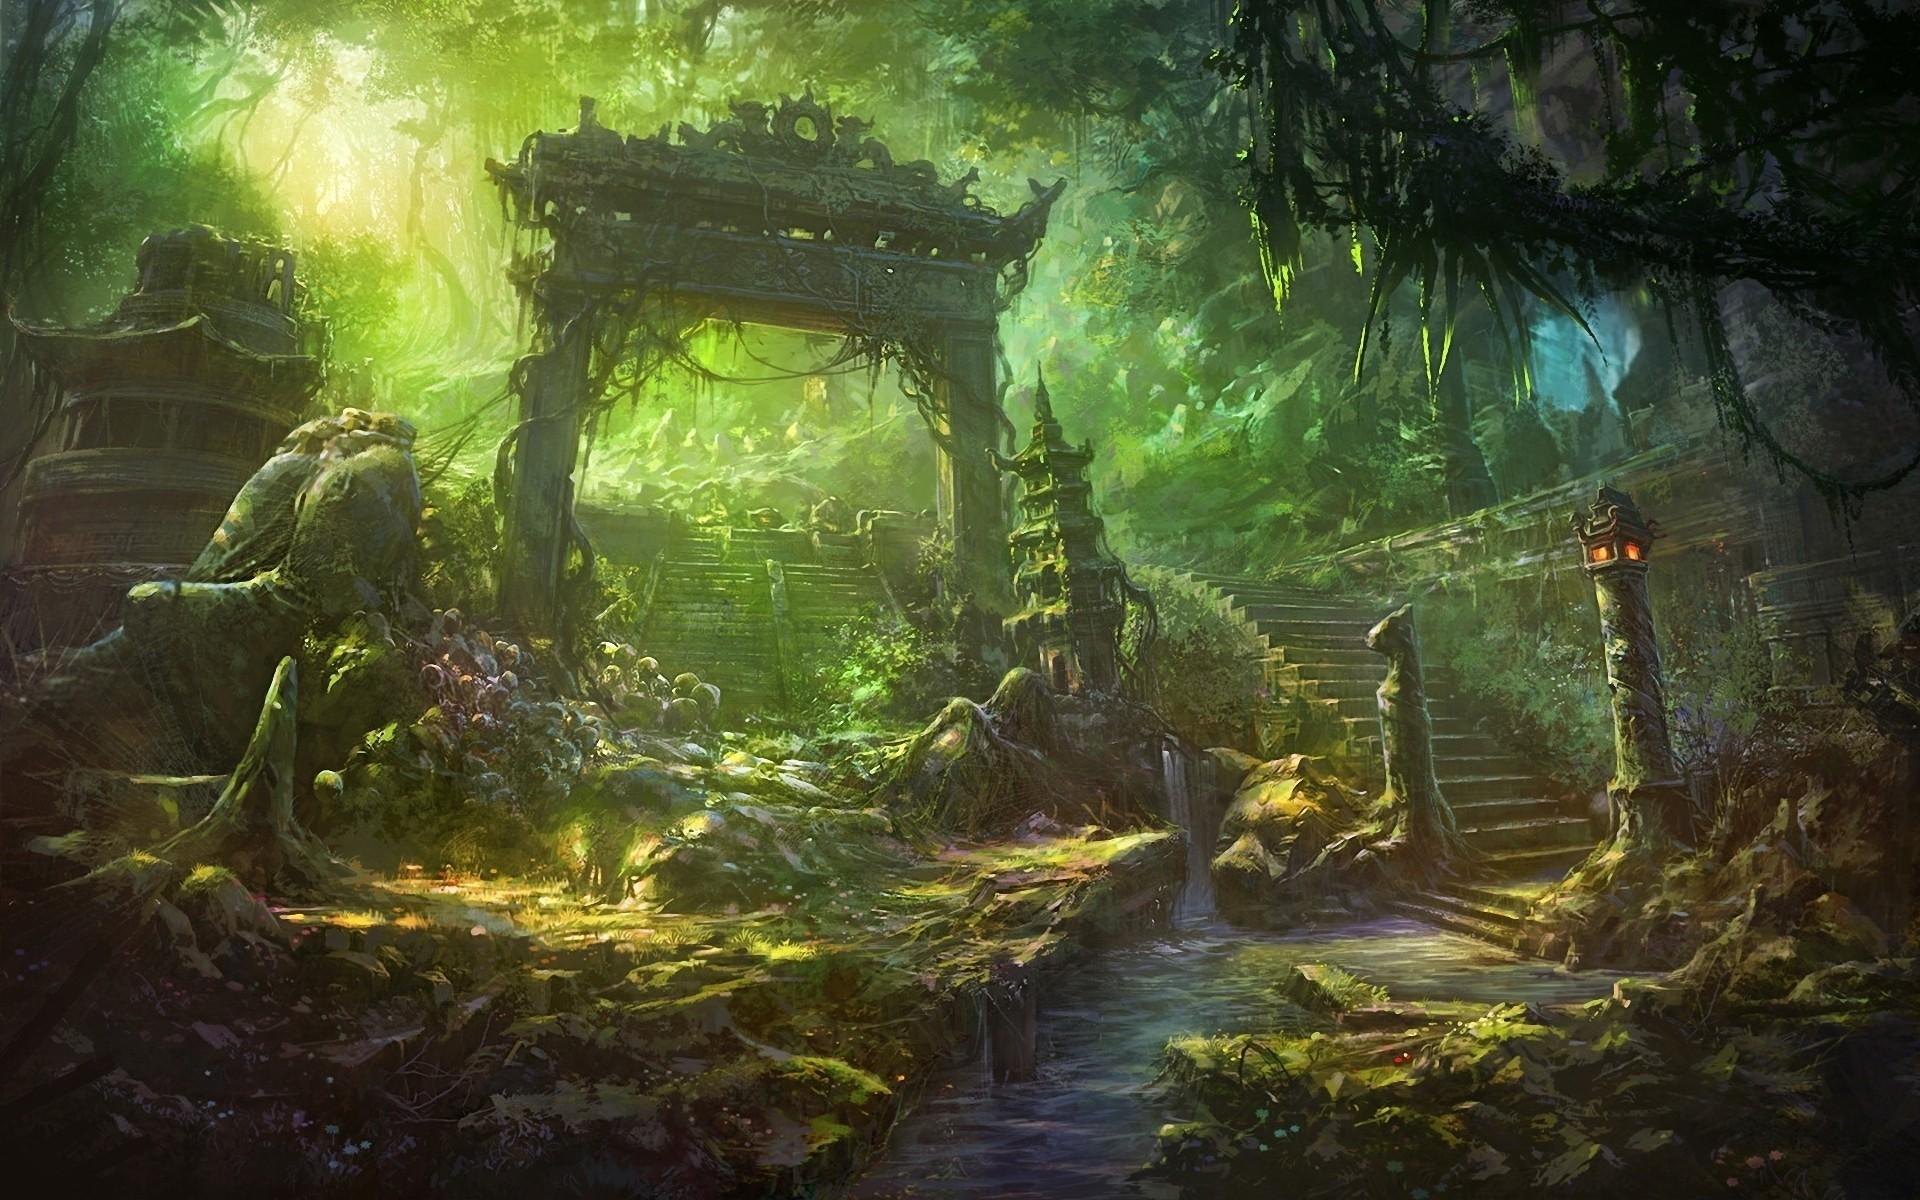 Anime Fantasy Forest Landscape Wallpapers